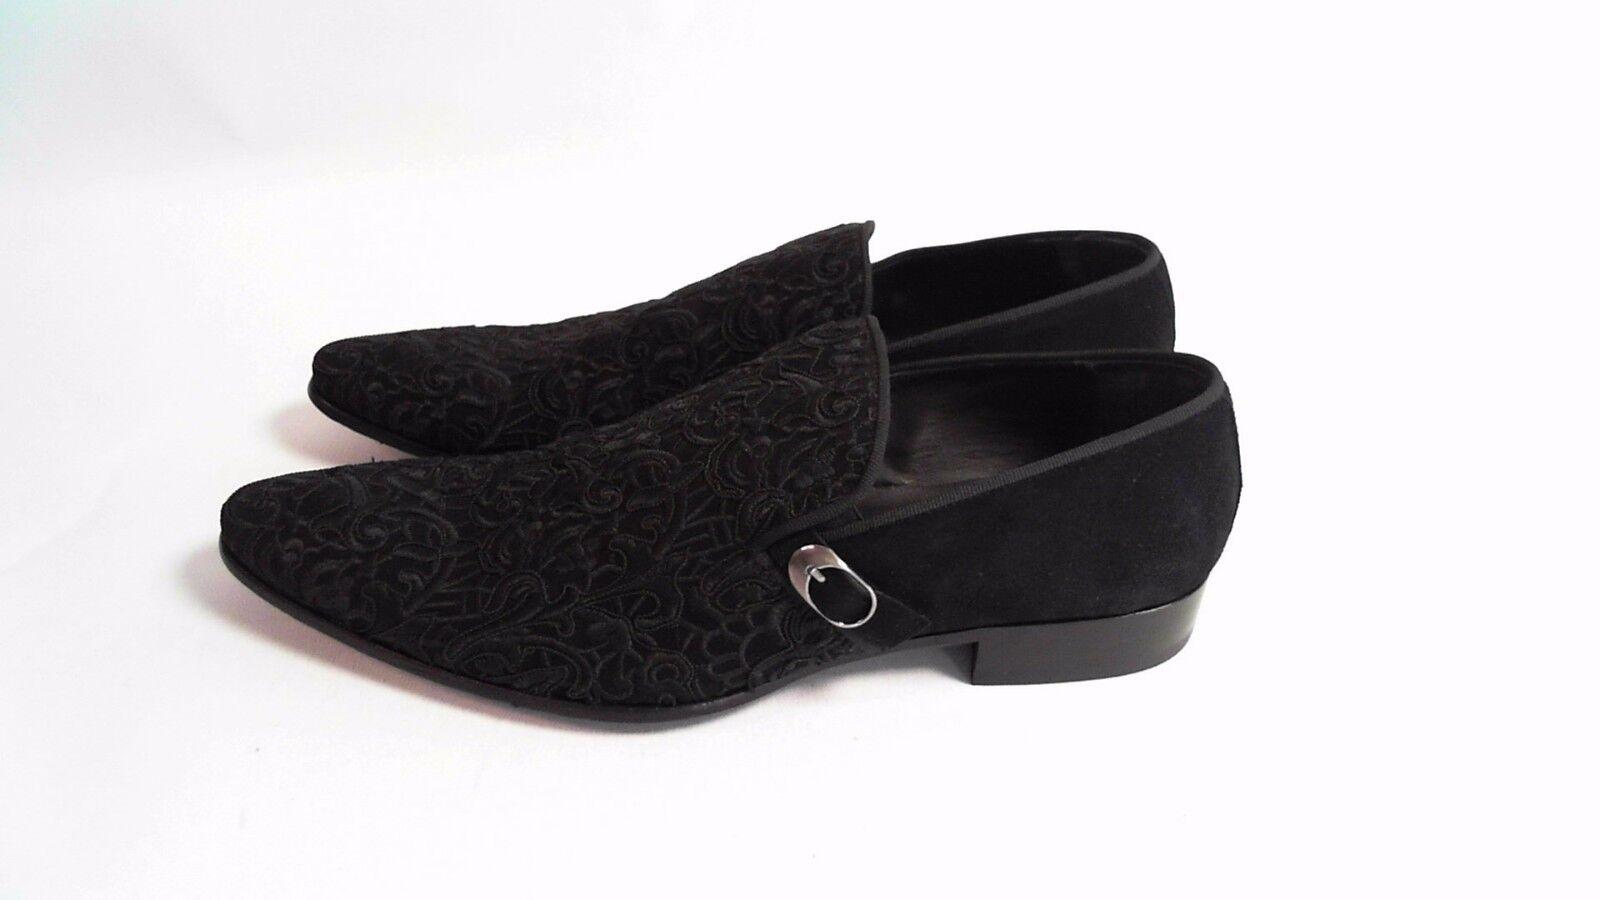 Bespoke HQ Men's Avery Shoes Lace Suede Italian Leather Black EU 45 #18B238